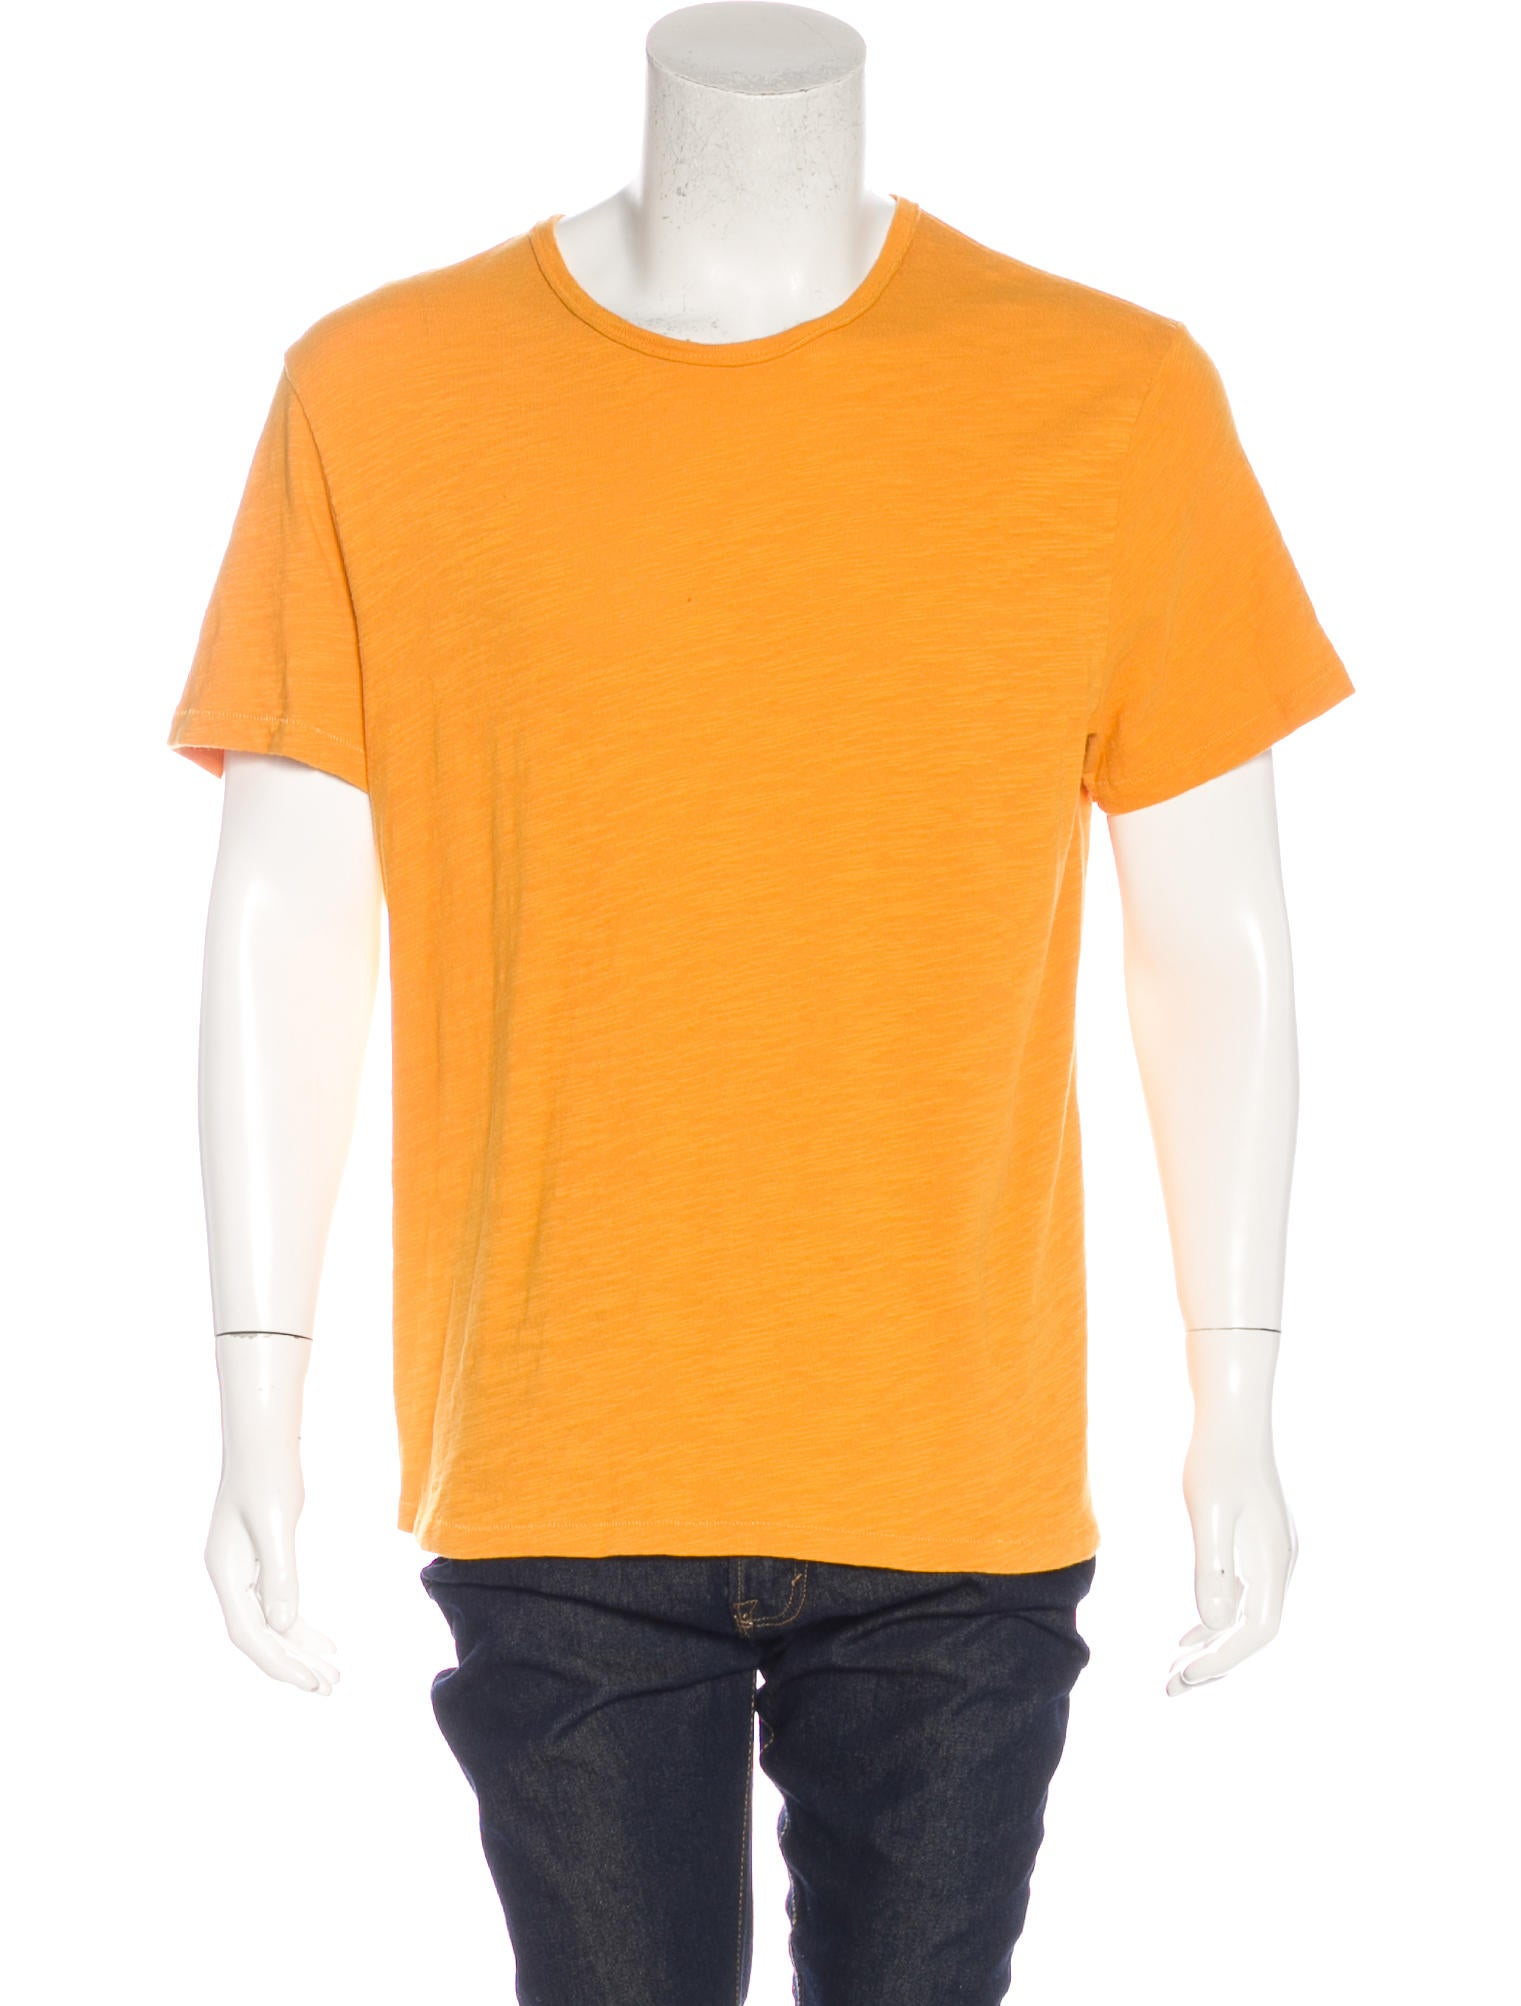 Rag bone crew neck t shirt clothing wragb71801 the for Rag and bone t shirts